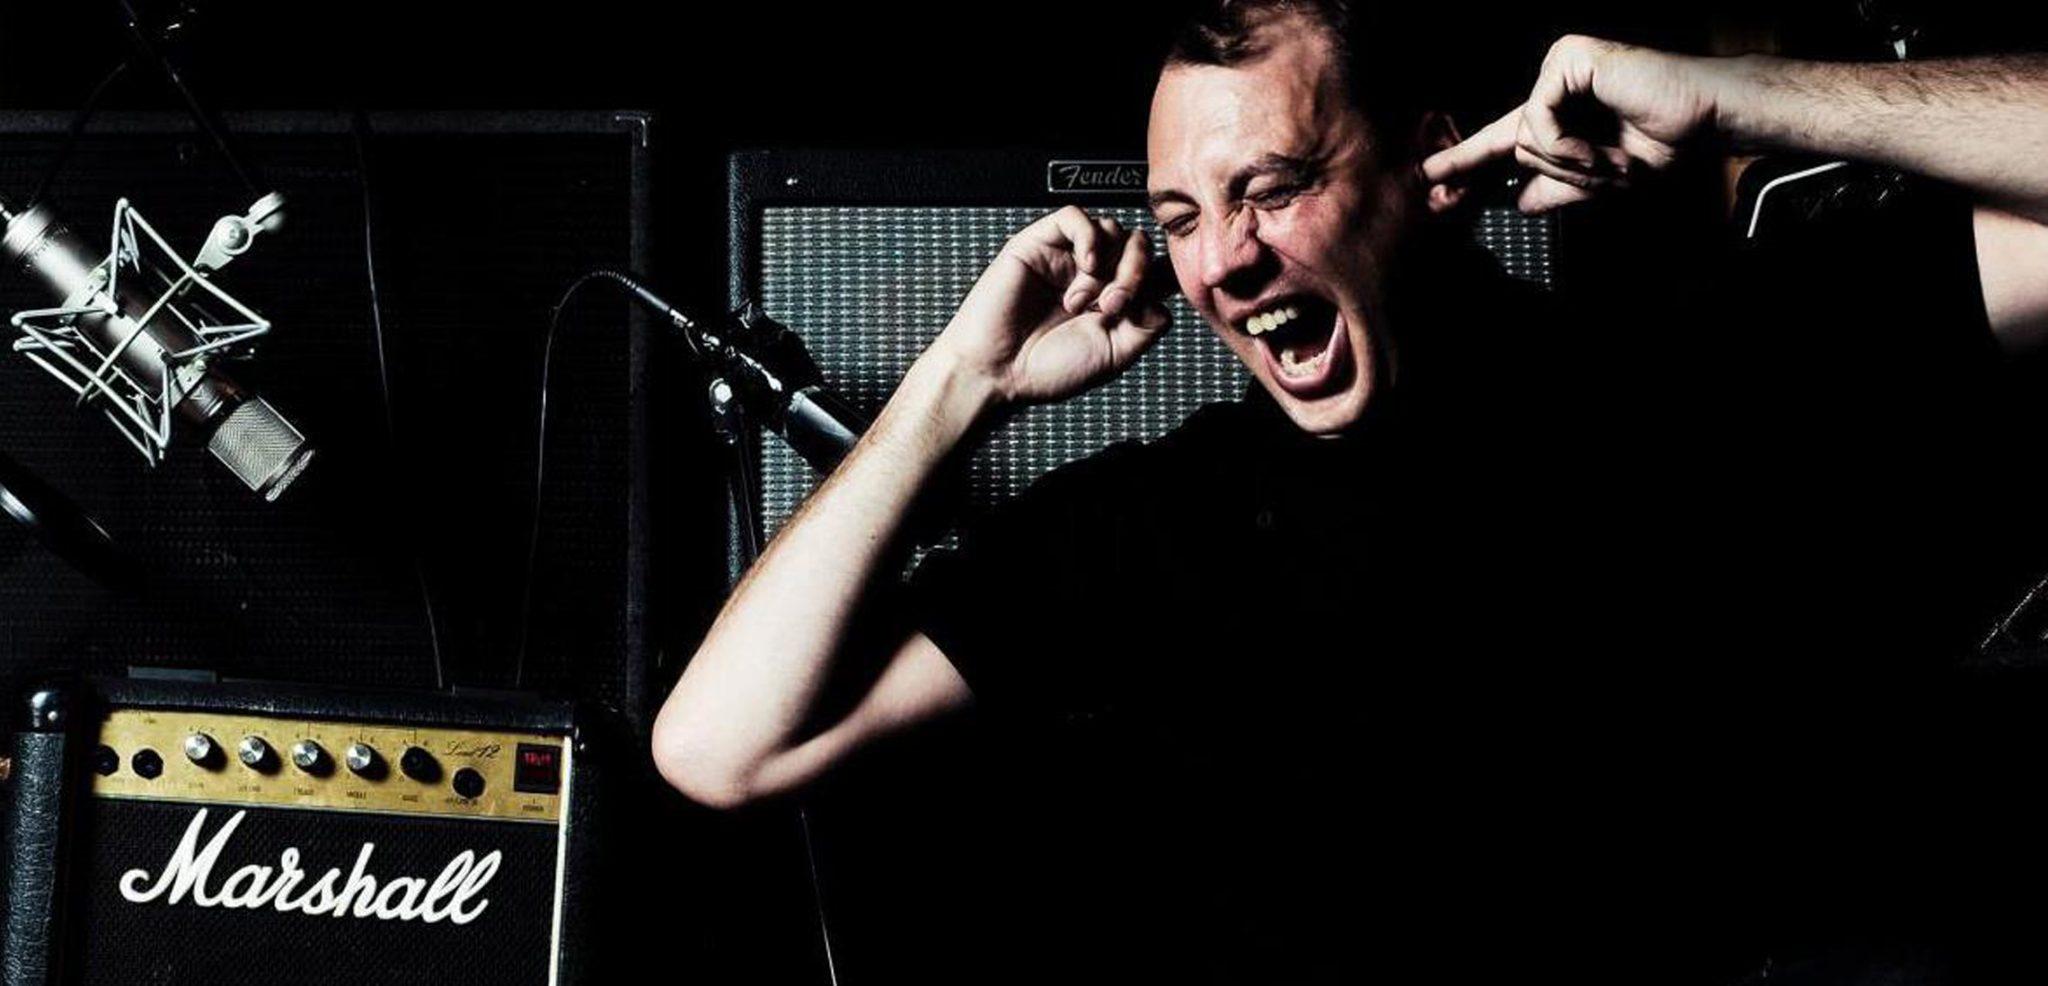 Timo Garcia & Wagstaff  - Fibonacci (incl. Copy Paste Soul & Jacky (UK) Remixes) hero